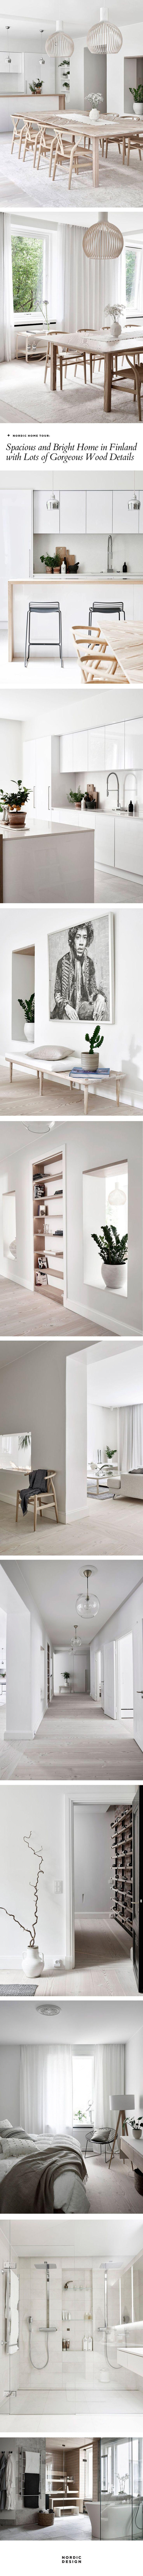 Best 25+ Nordic design ideas on Pinterest | Nordic interior ...